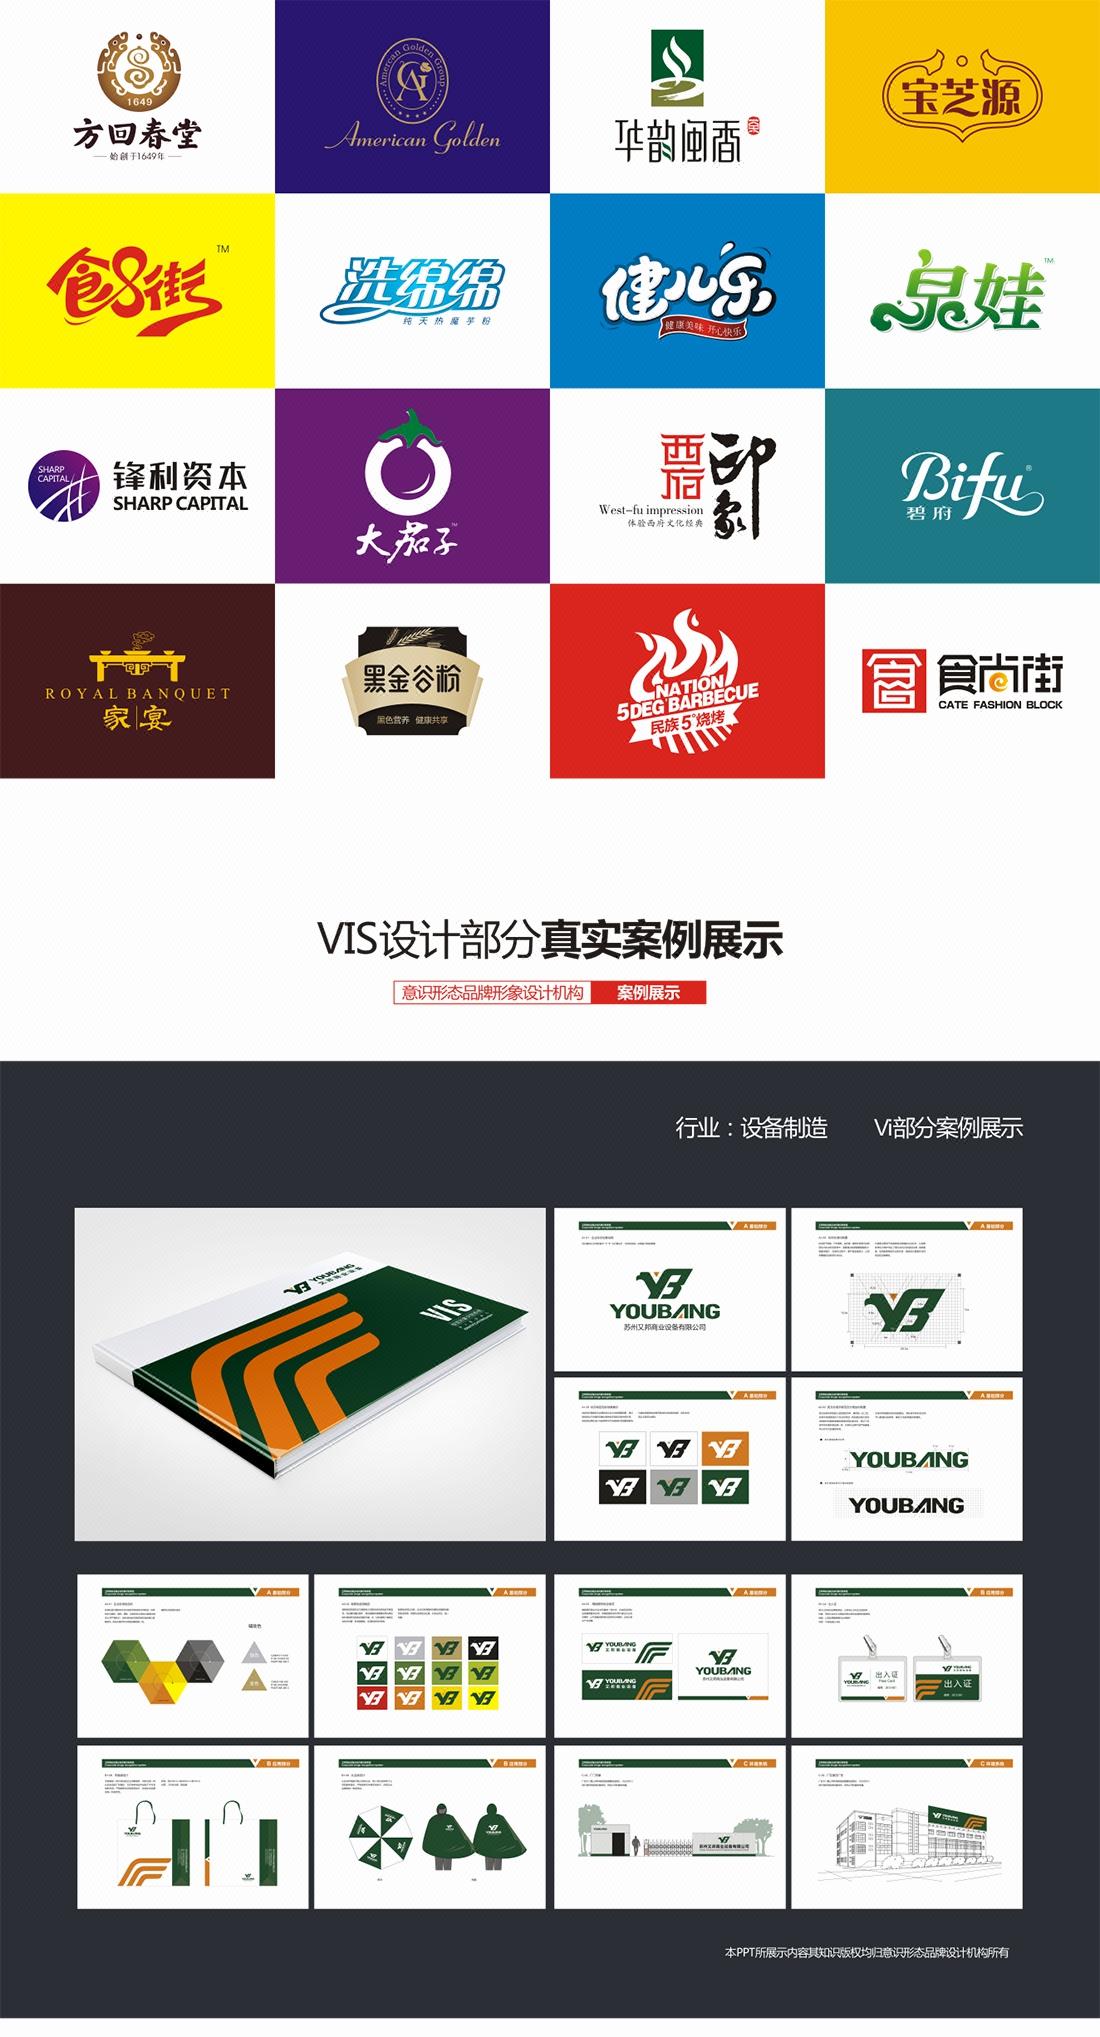 LOGO更新升级_公司企业logo设计平面餐饮门店LOGO图形标志品牌商标设计5